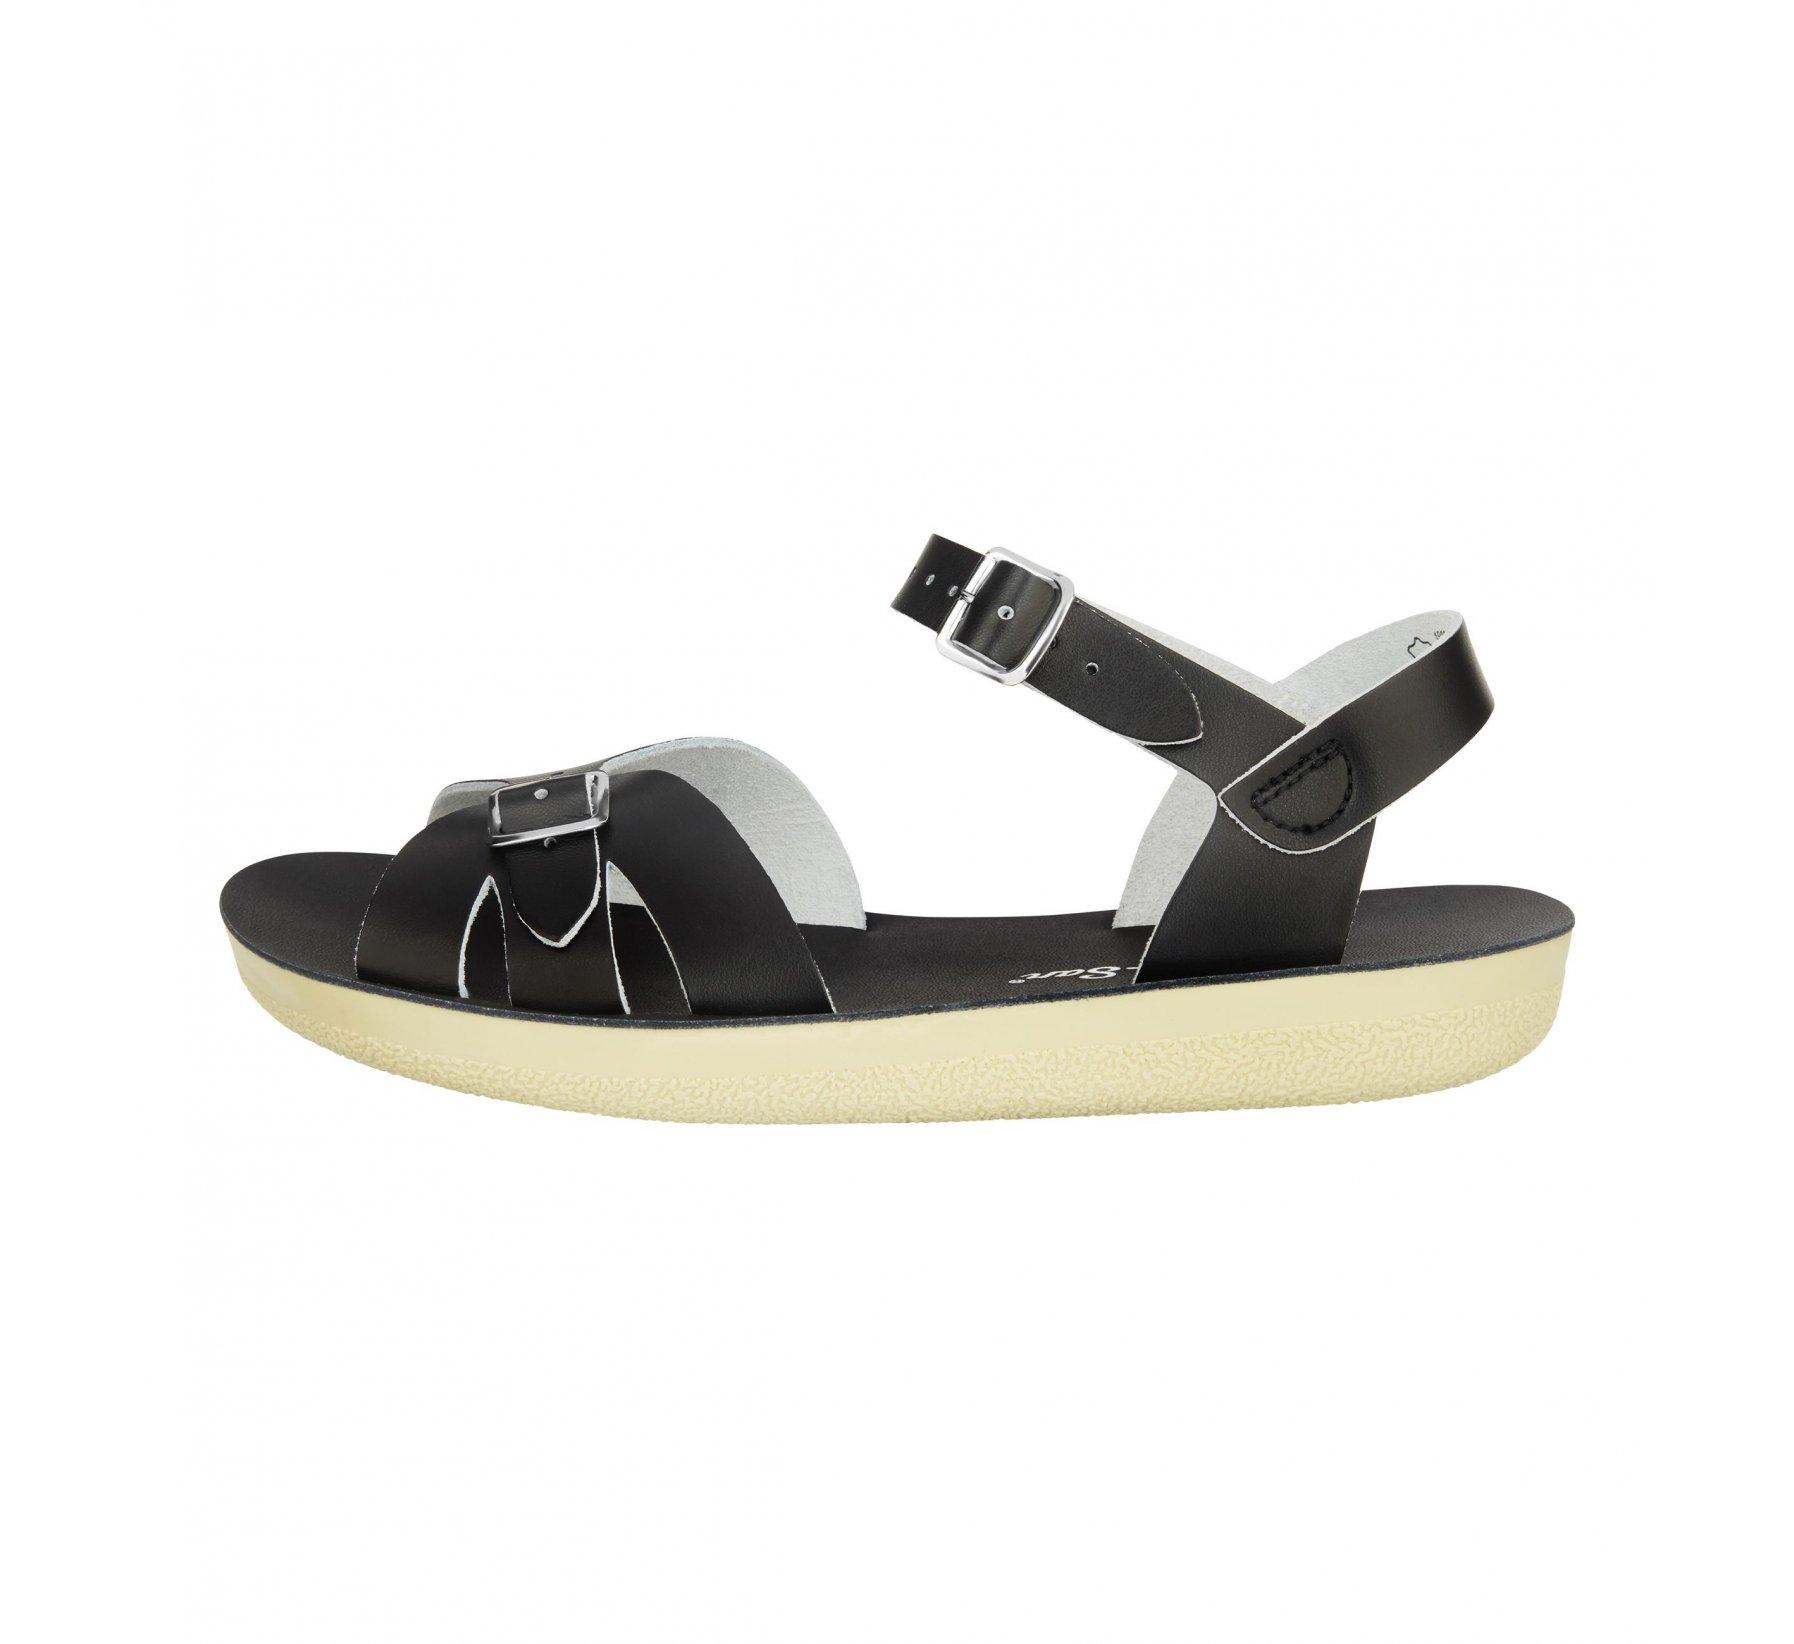 Boardwalk Black - Salt Water Sandals